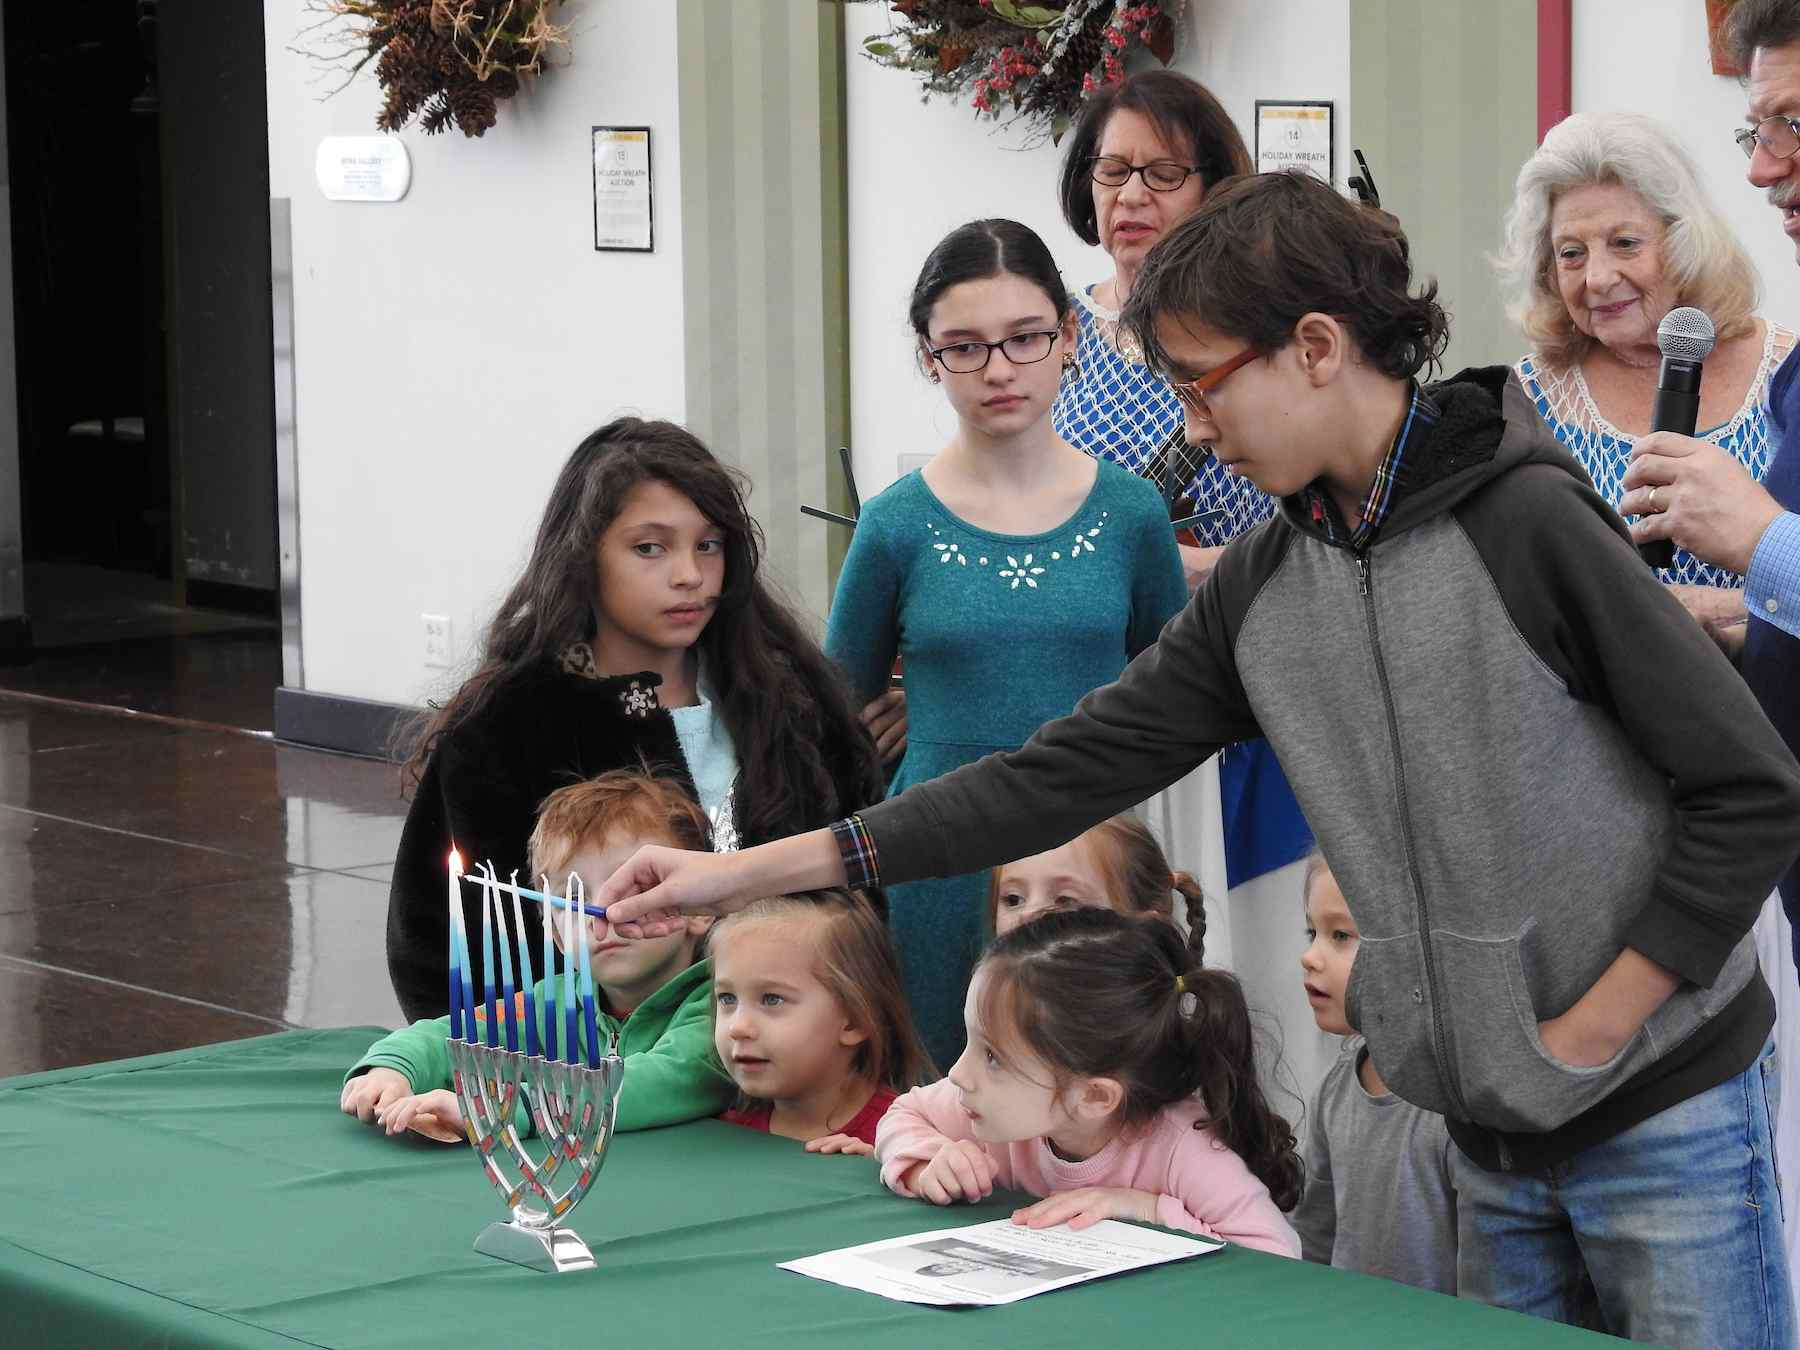 Chanukah celebration at the Missouri Botanical Garden